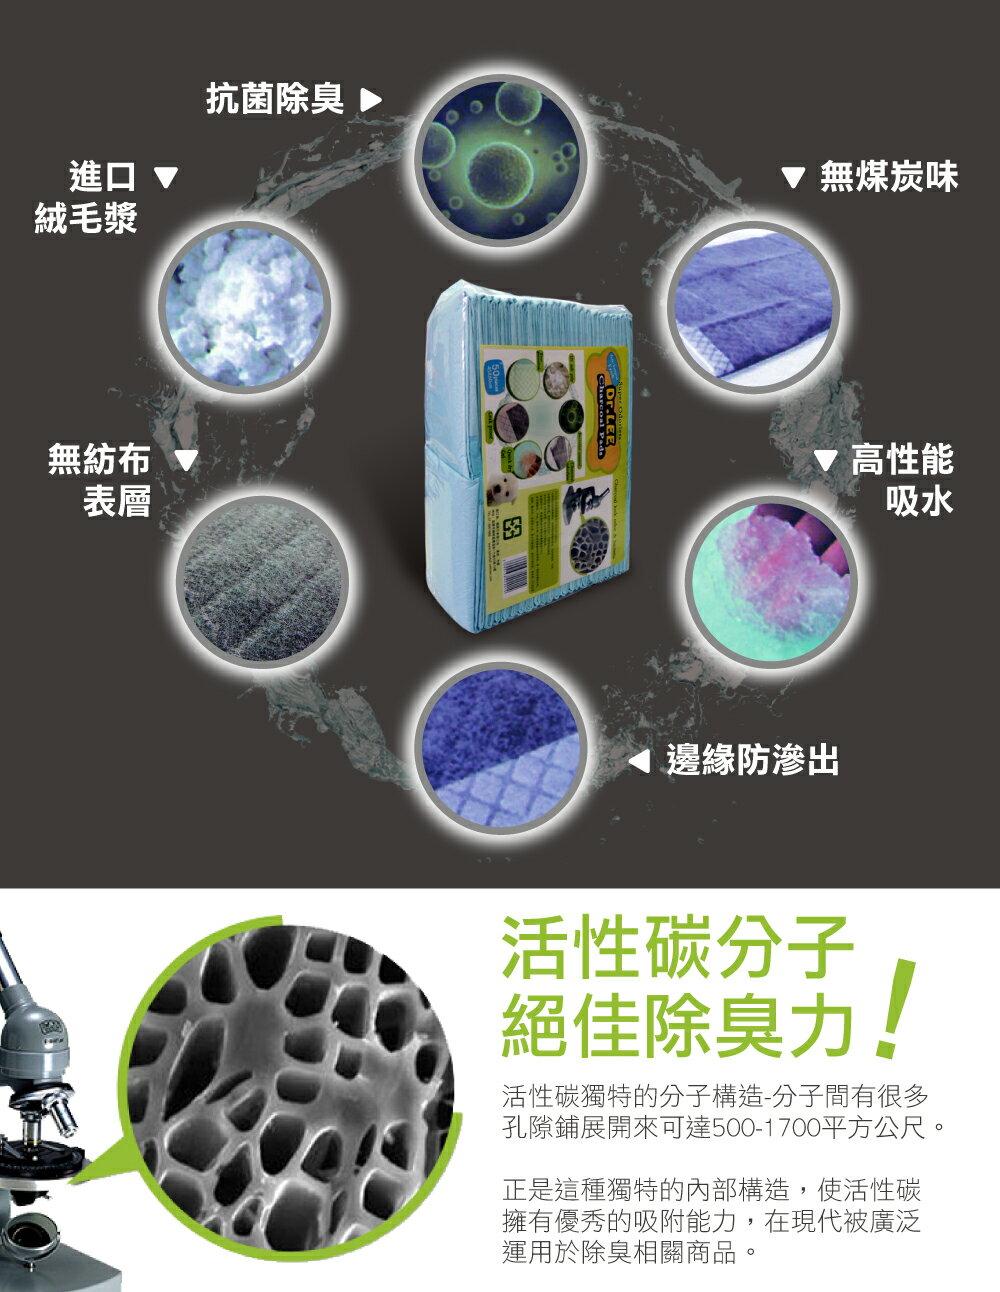 Dr. Lee 專業用活性碳尿布 寵物尿布墊  50入(45*60cm) 限3包內可超取(H003A12) 3